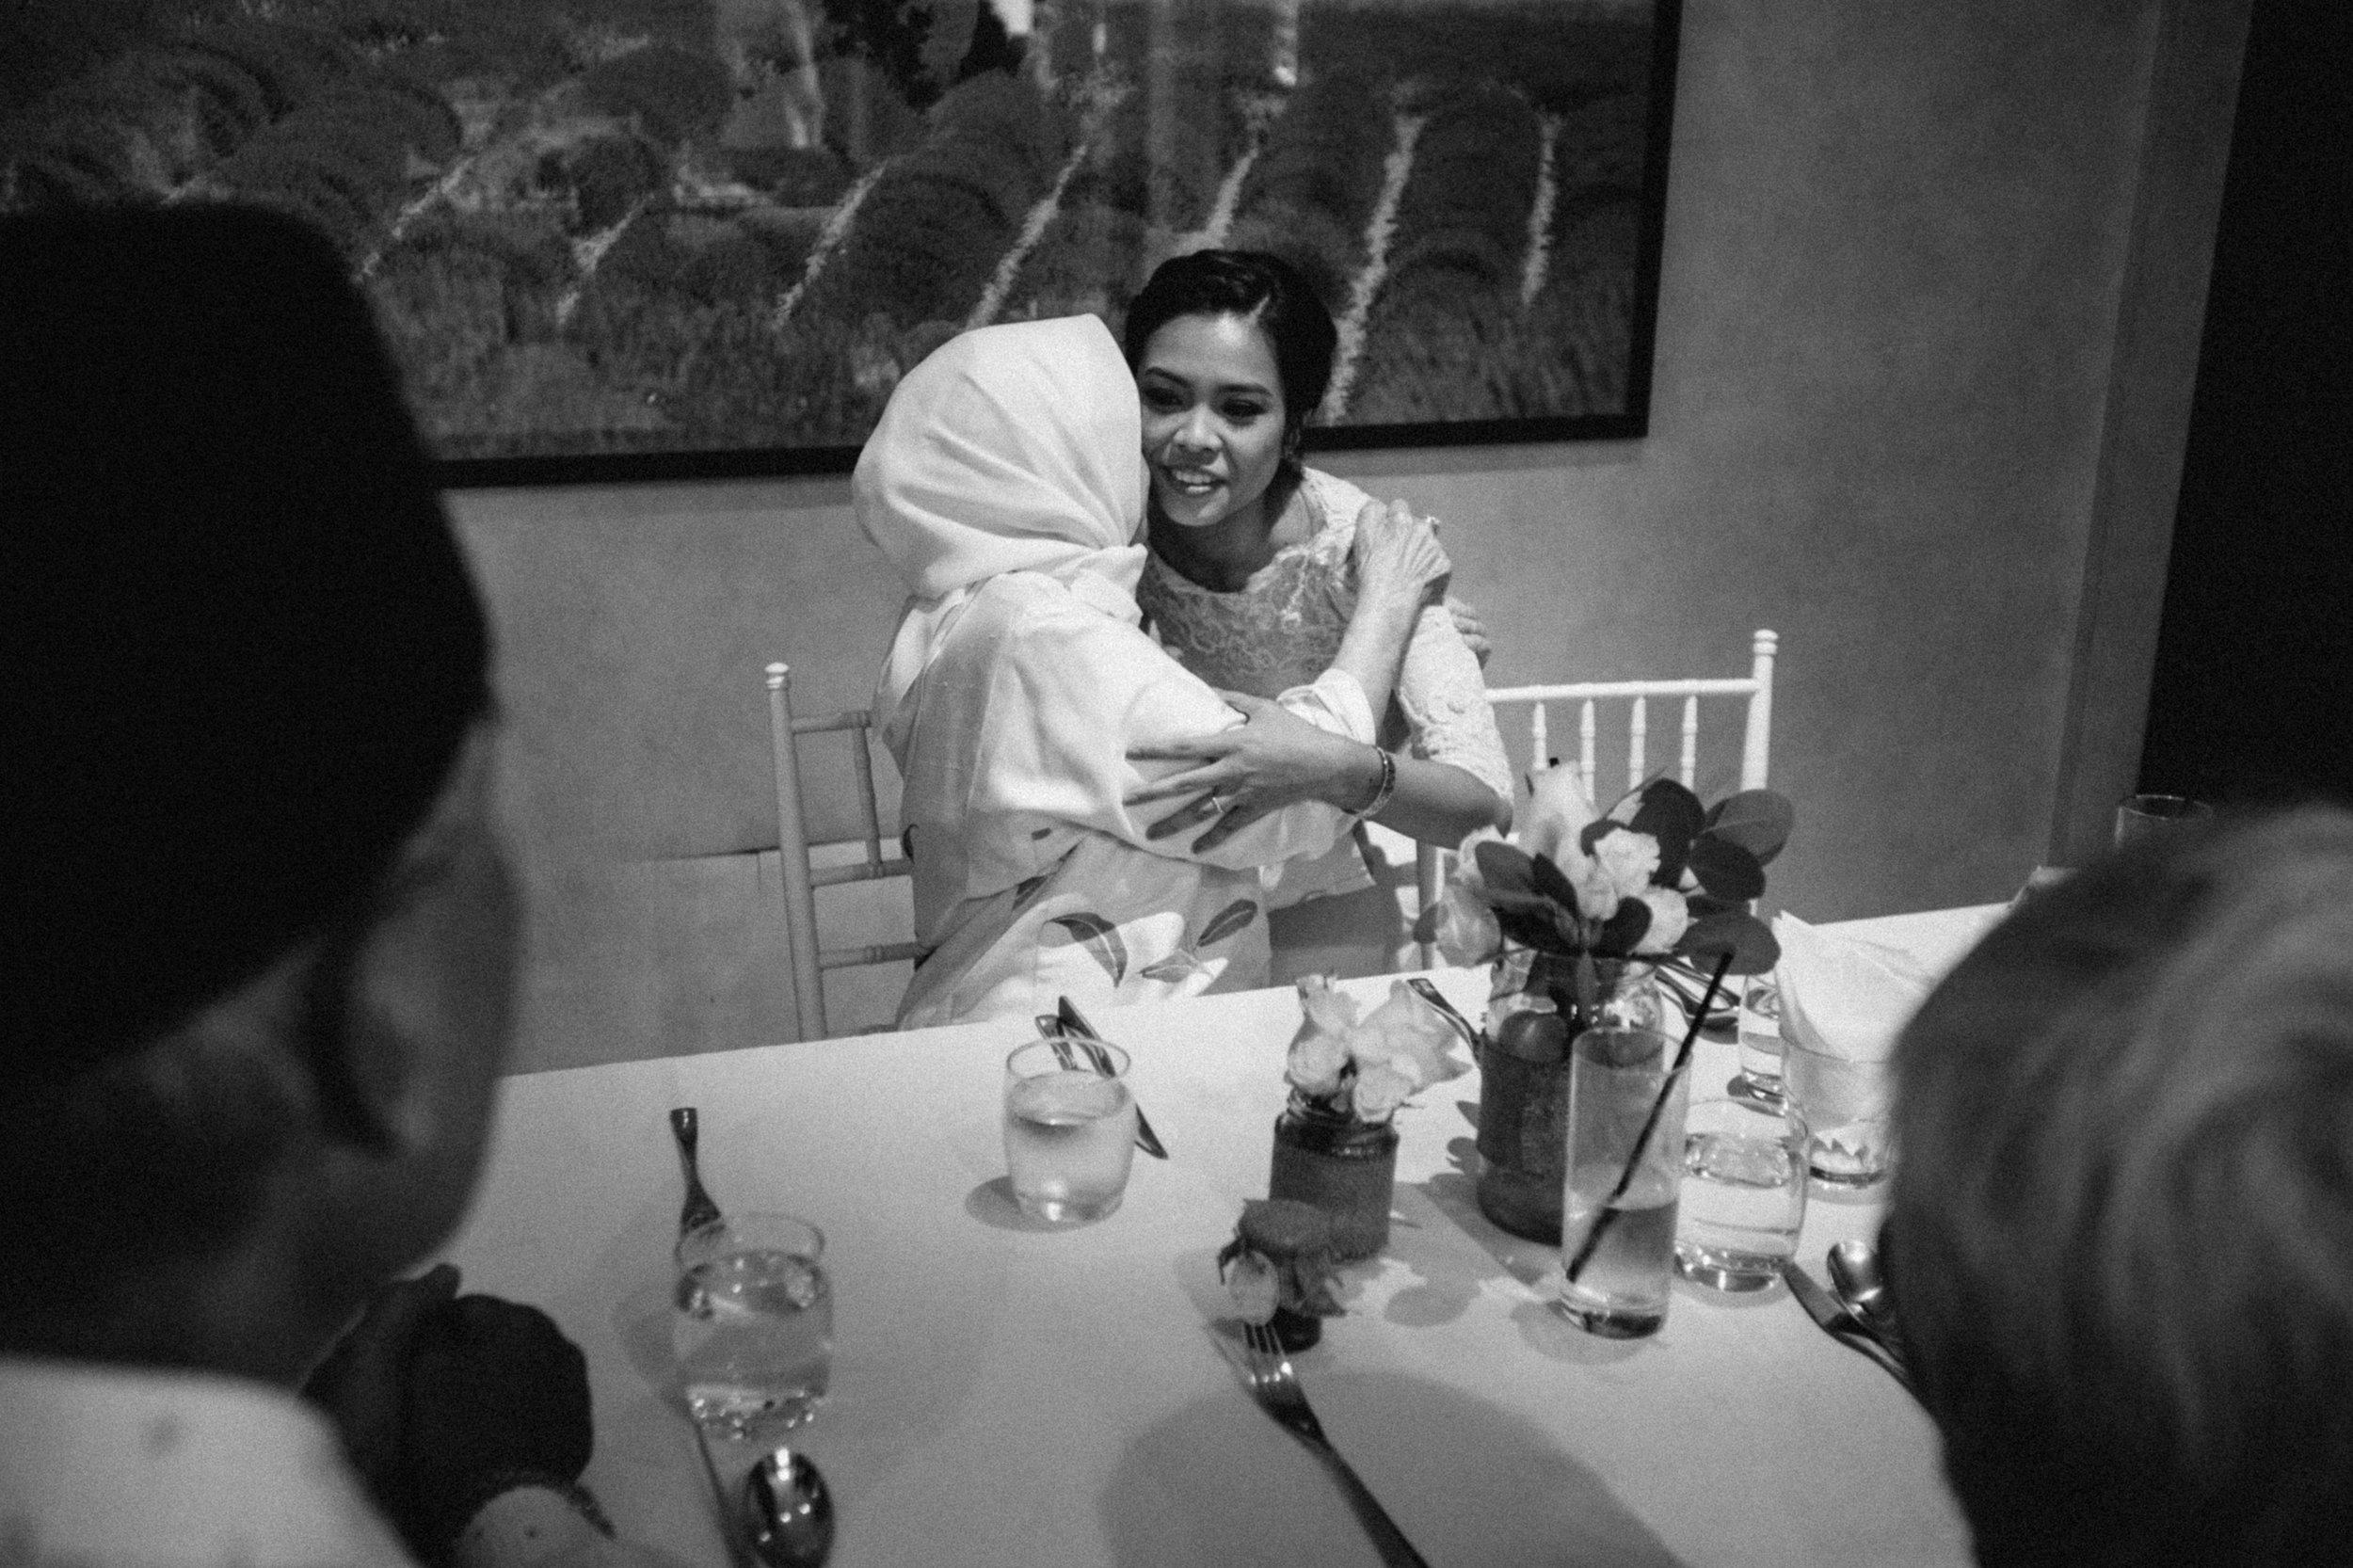 singapore-wedding-photographer-fadilah-kwan-032.jpg